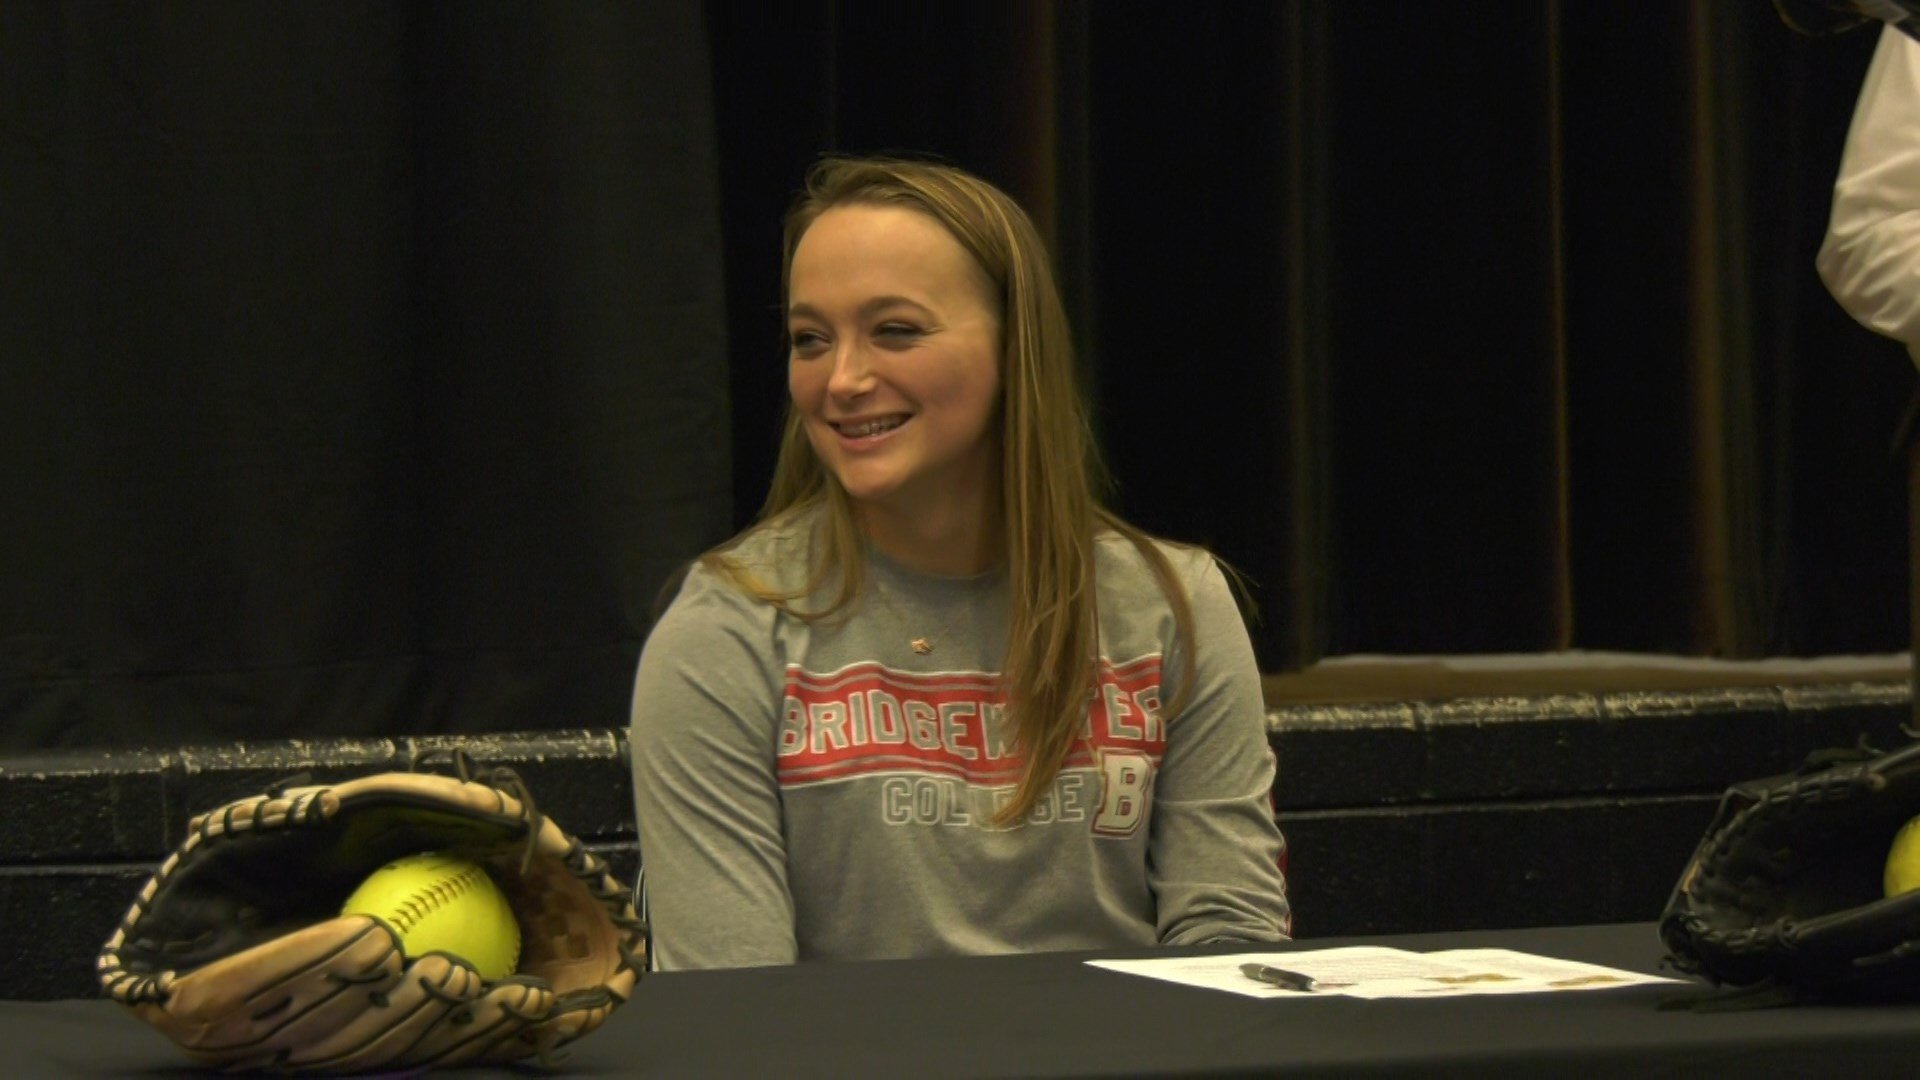 Emily Clifford will play softball at Bridgewater